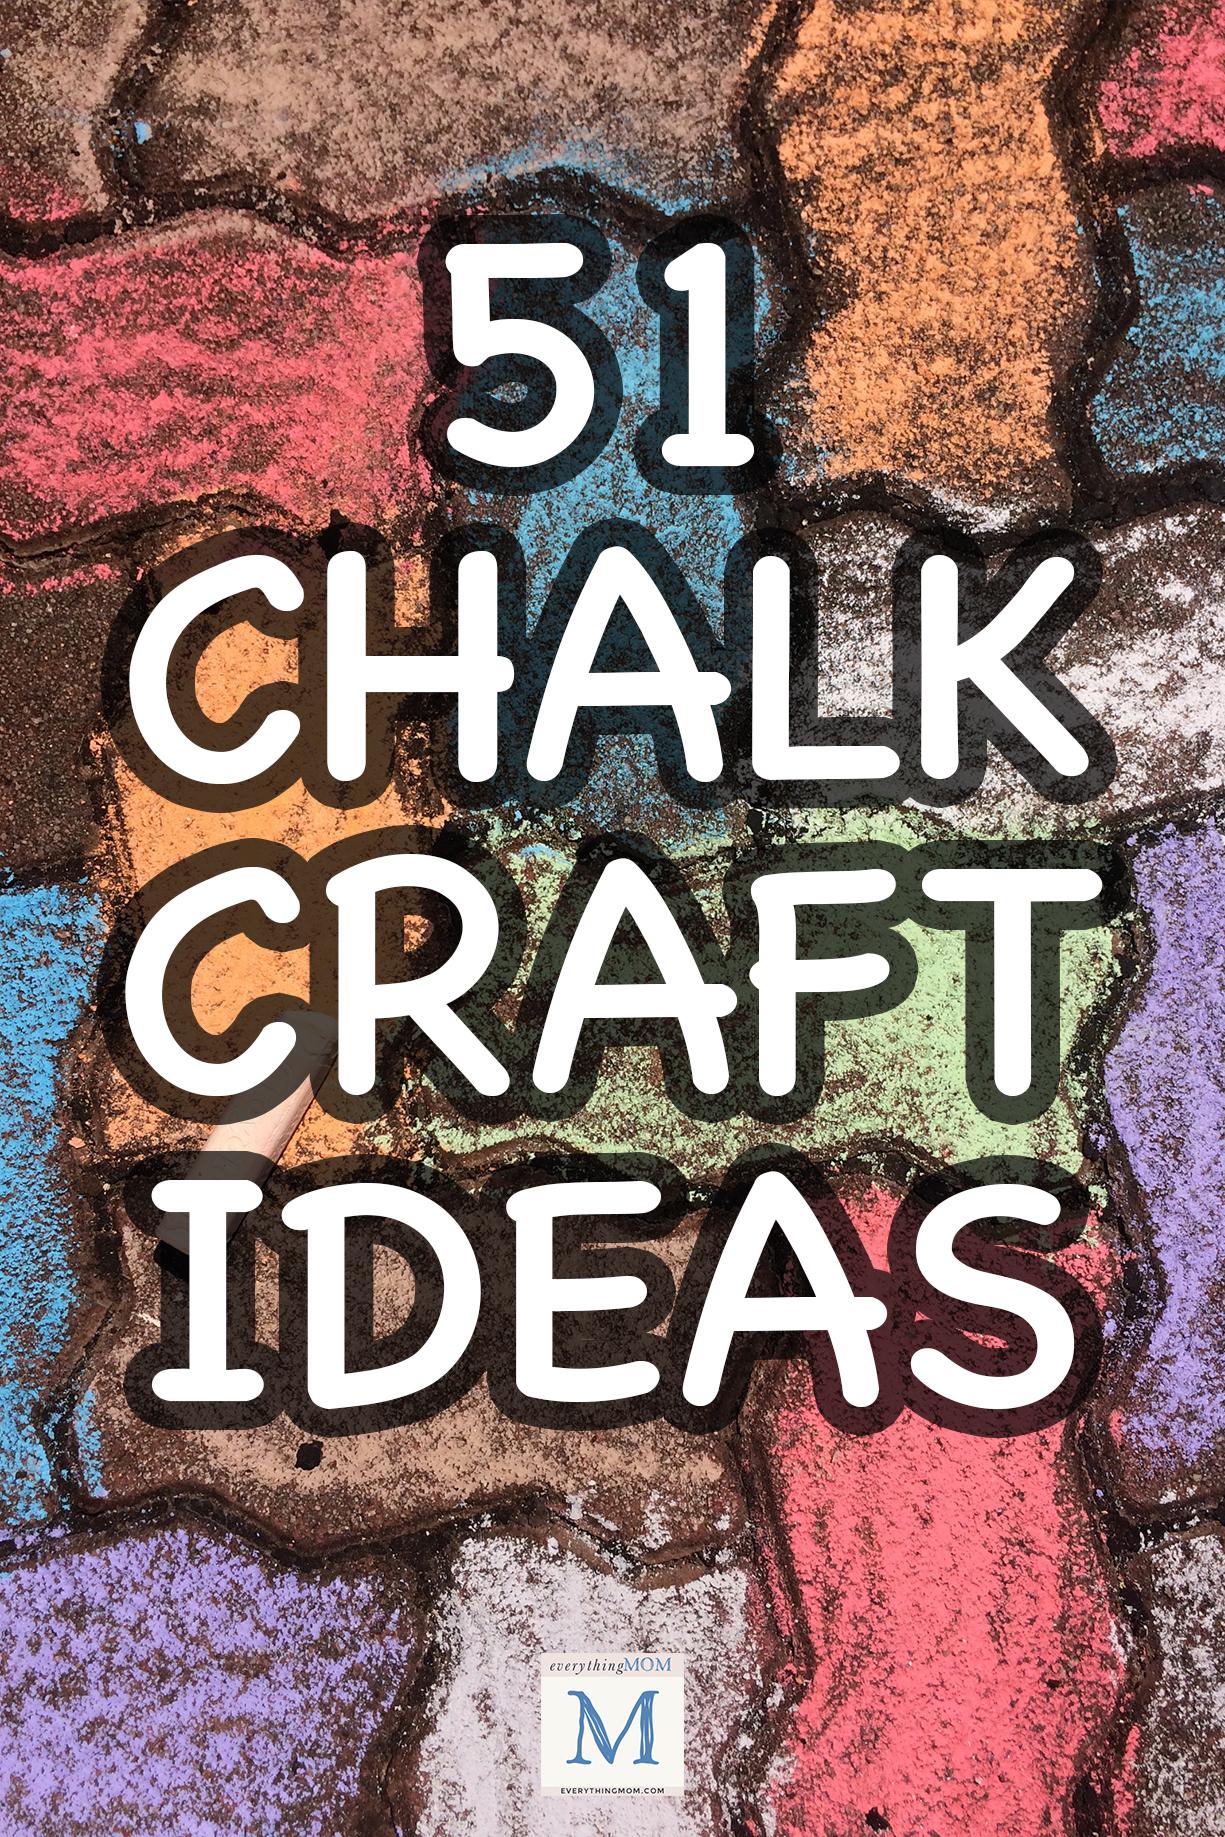 45 Easy Chalk Craft Ideas For Kids Everythingmom